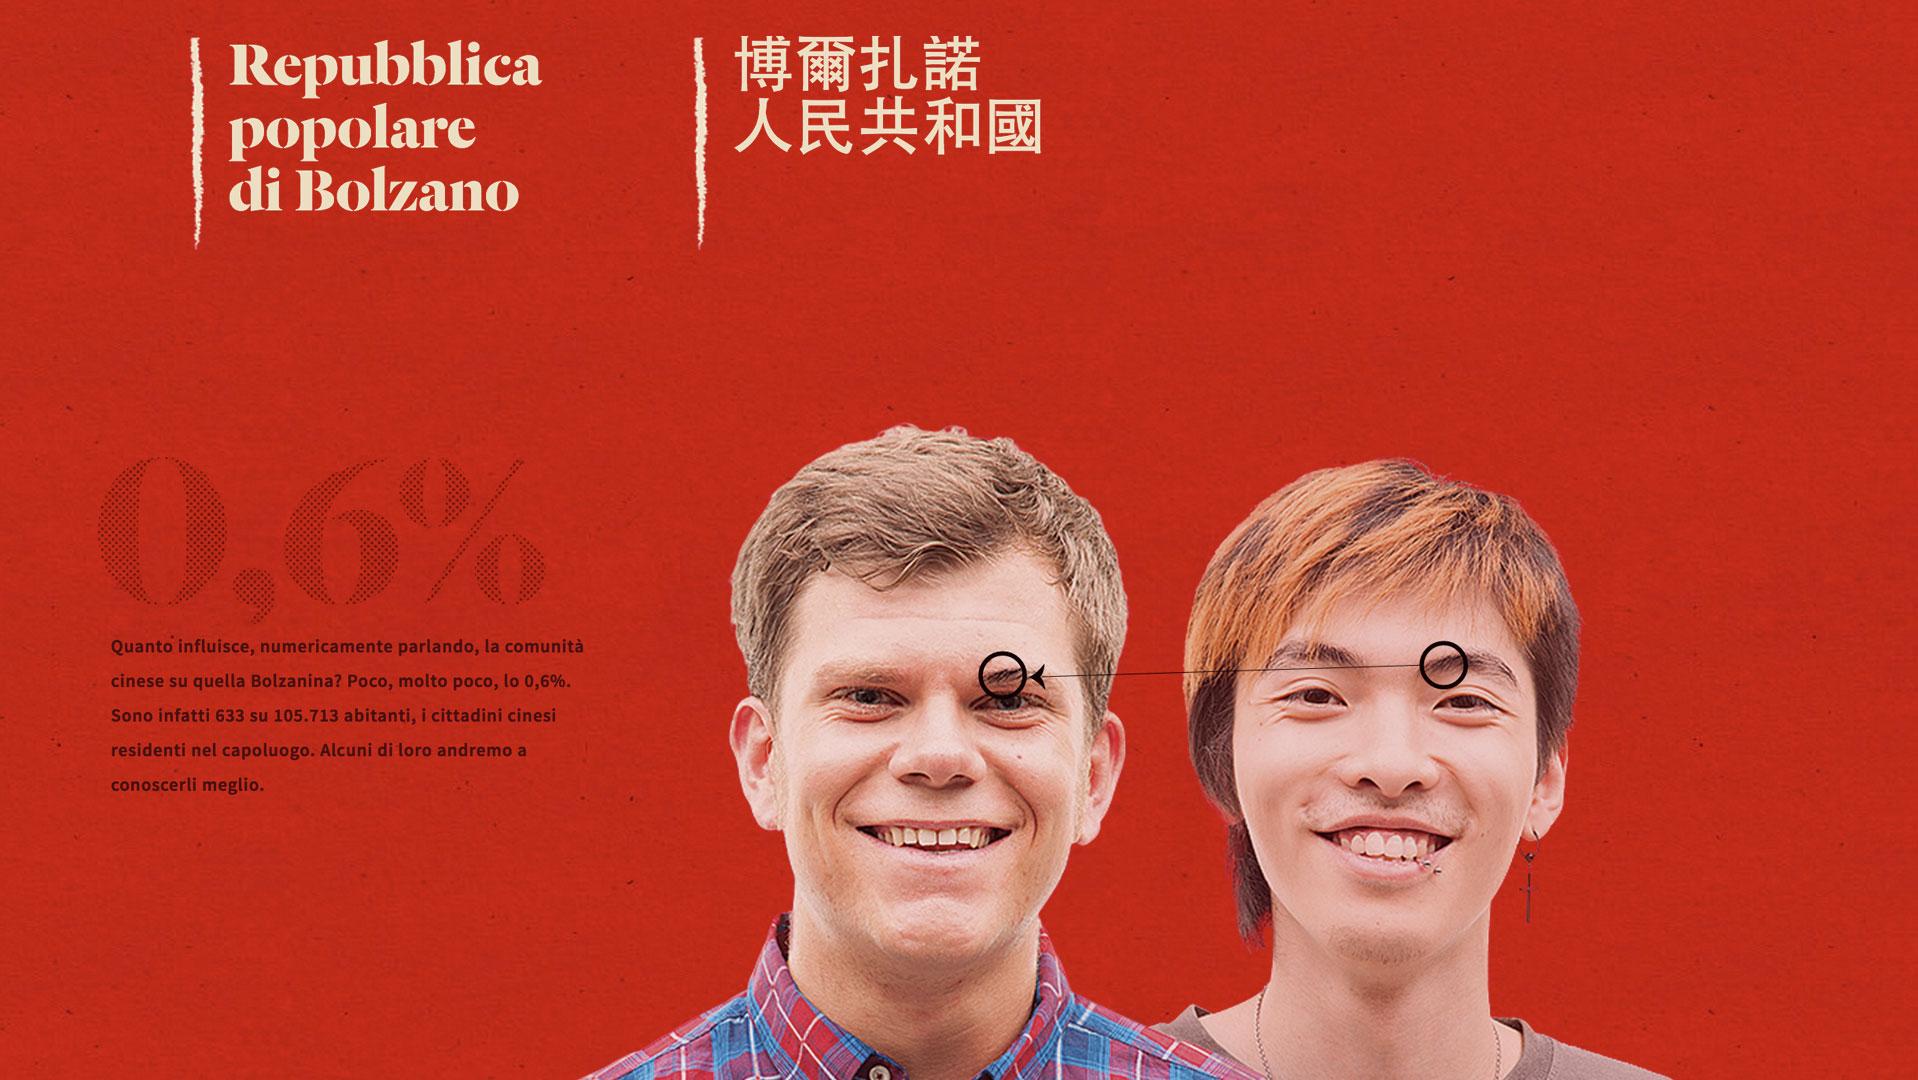 Matteo Moretti Gianluca seta fabio gobbato sarah trevisionl daniel graziotin infographic chinese society